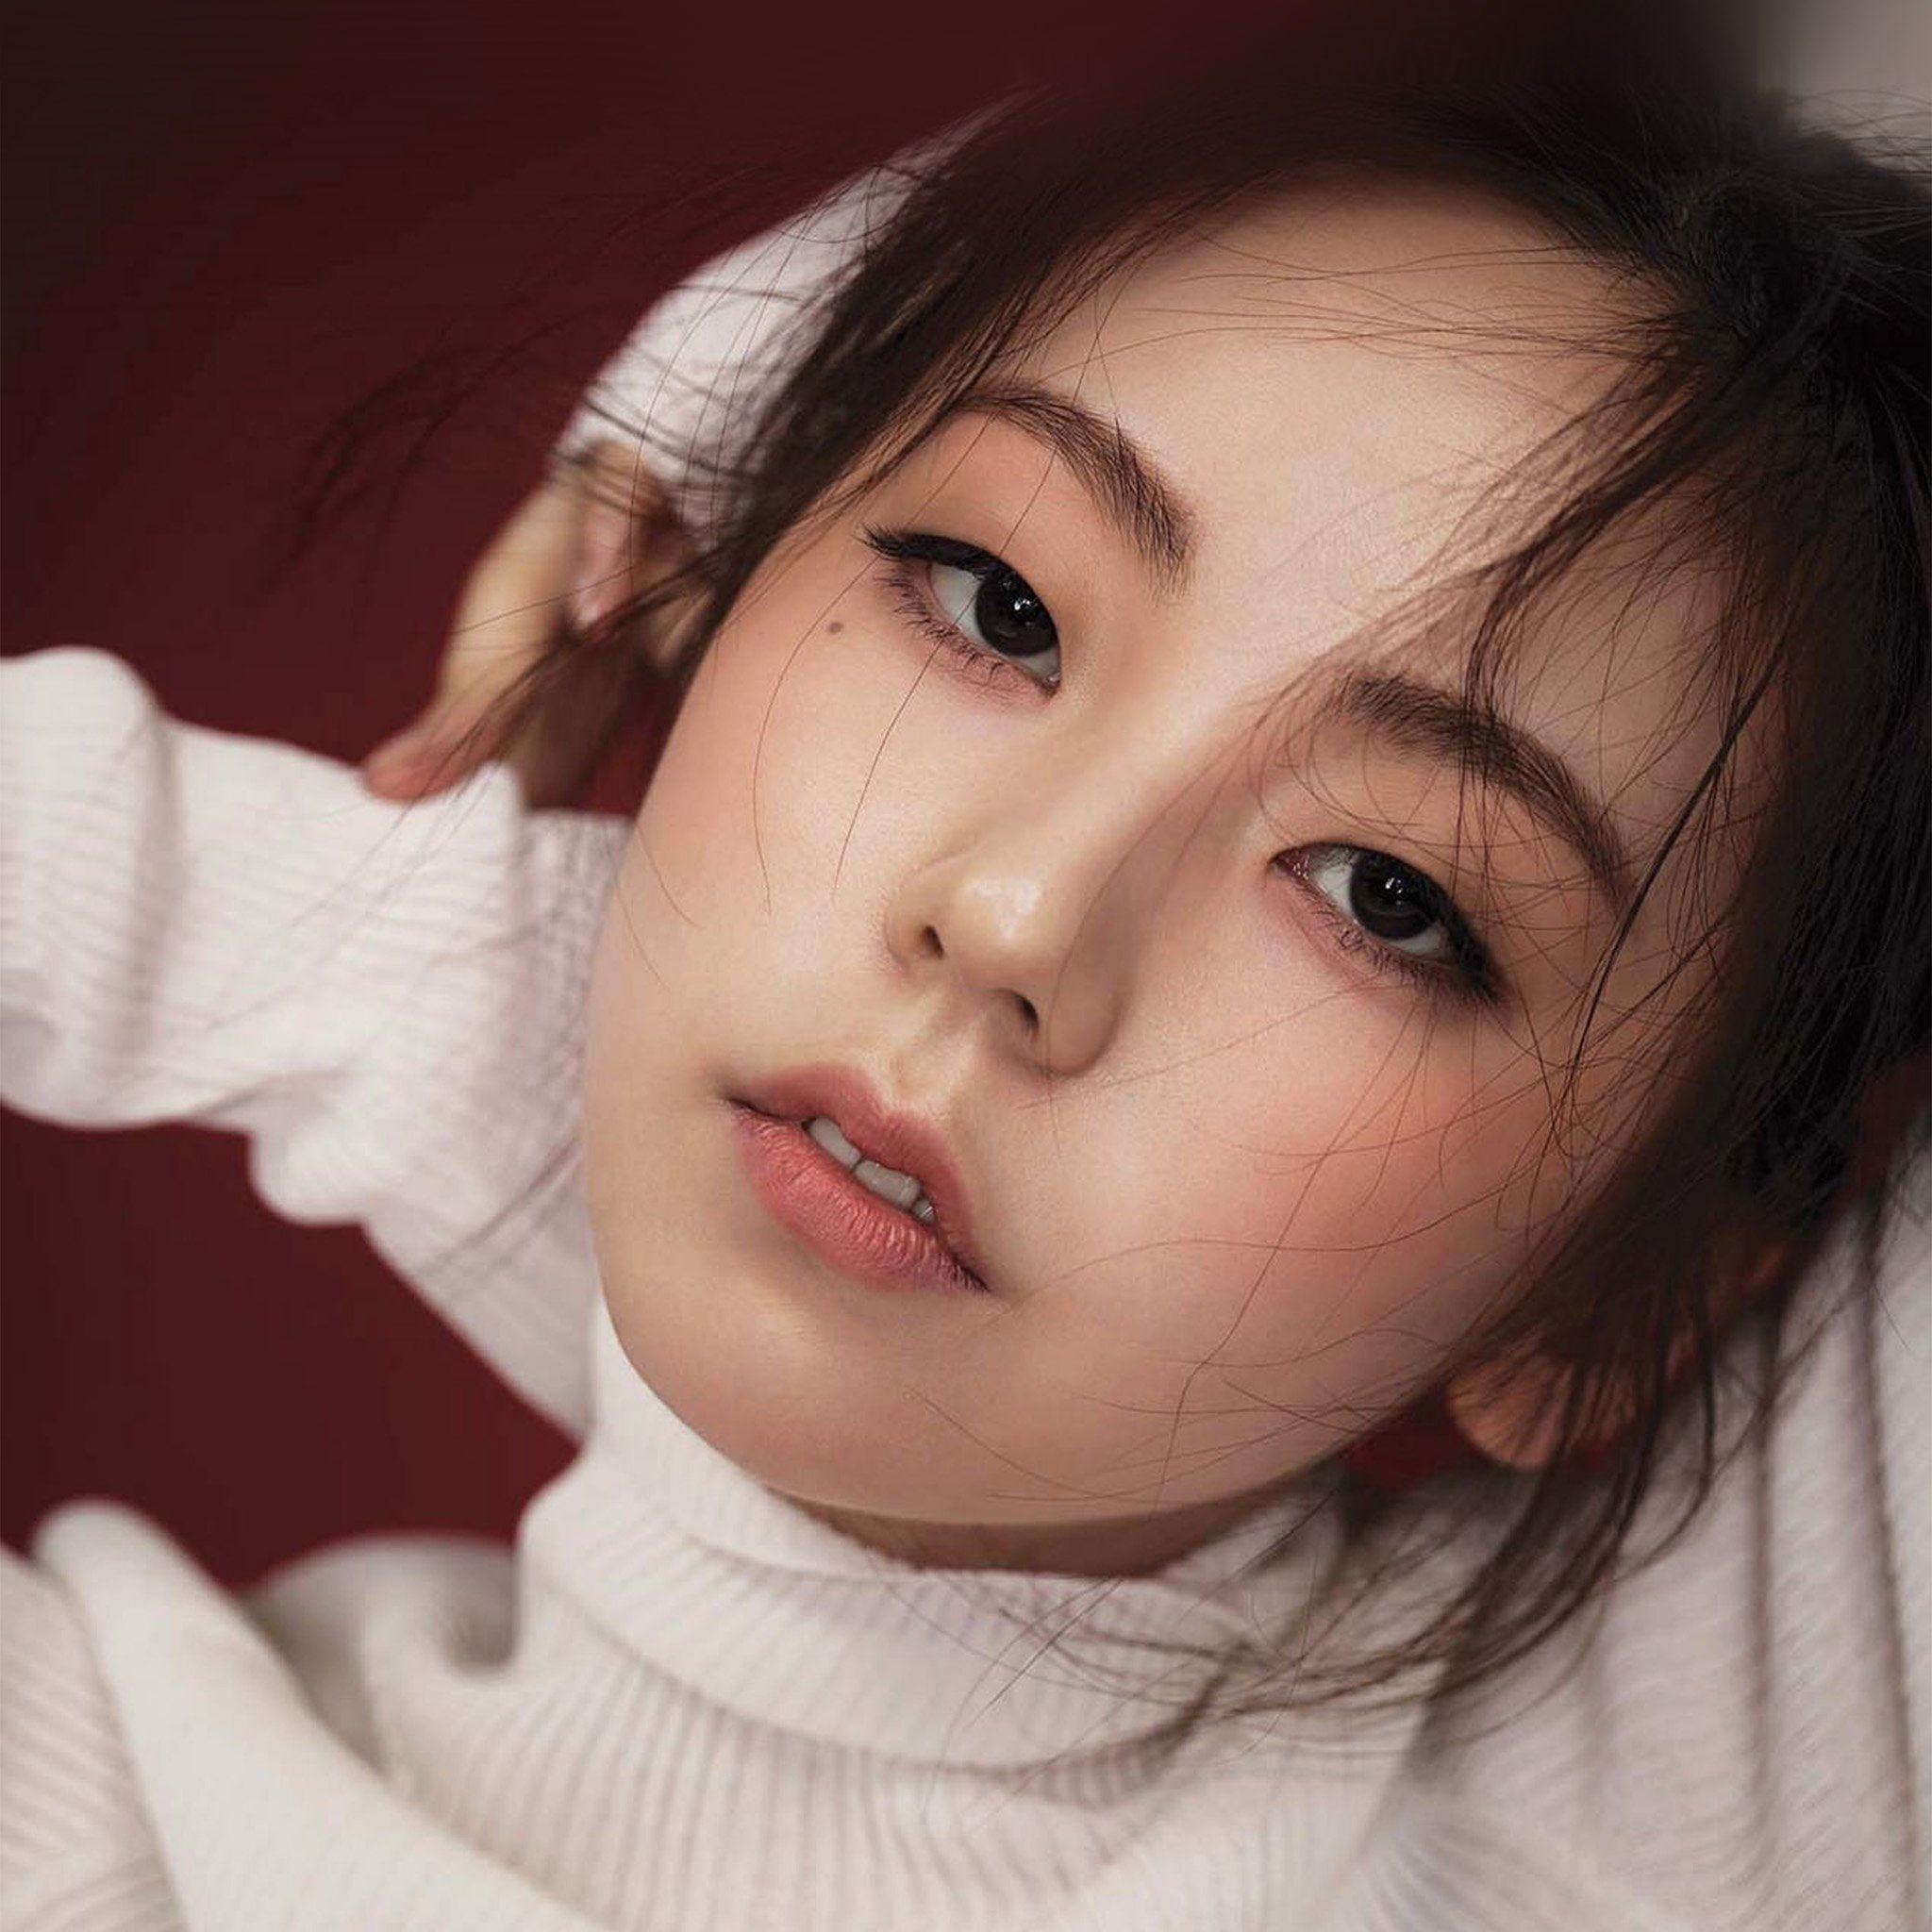 секретная фото японок без макияжа образ